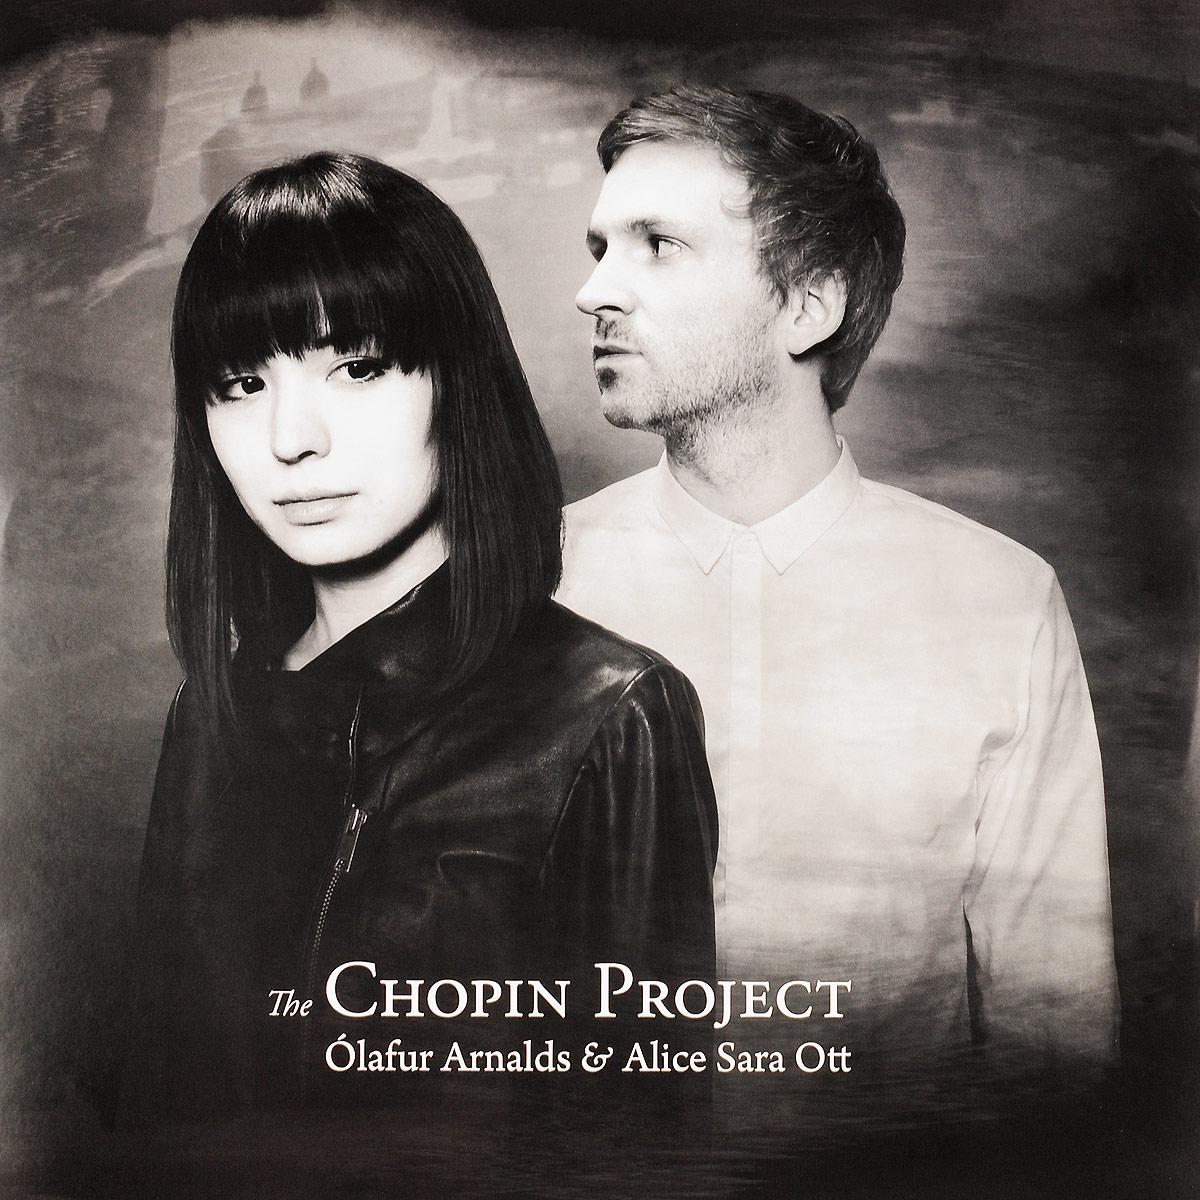 Олафур Арналдс,Элис Сара Отт Olafur Arnalds And Alice Sara Ott. The Chopin Project (LP) olafur arnalds broadchurch lp